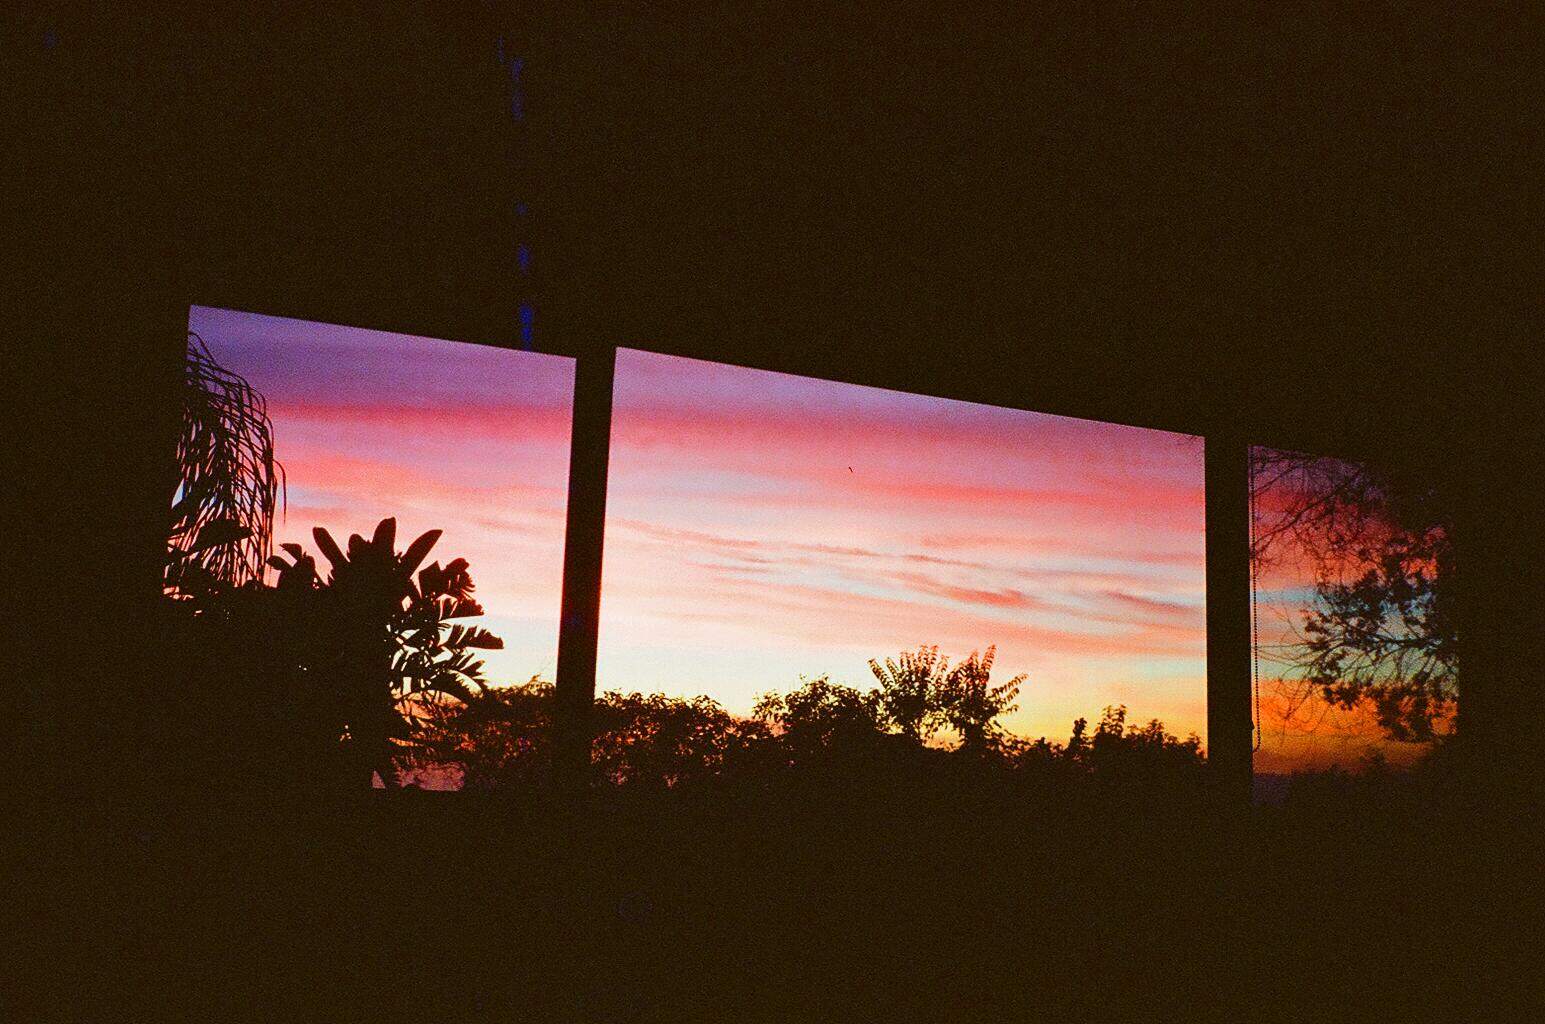 sunsetframe 2.jpg